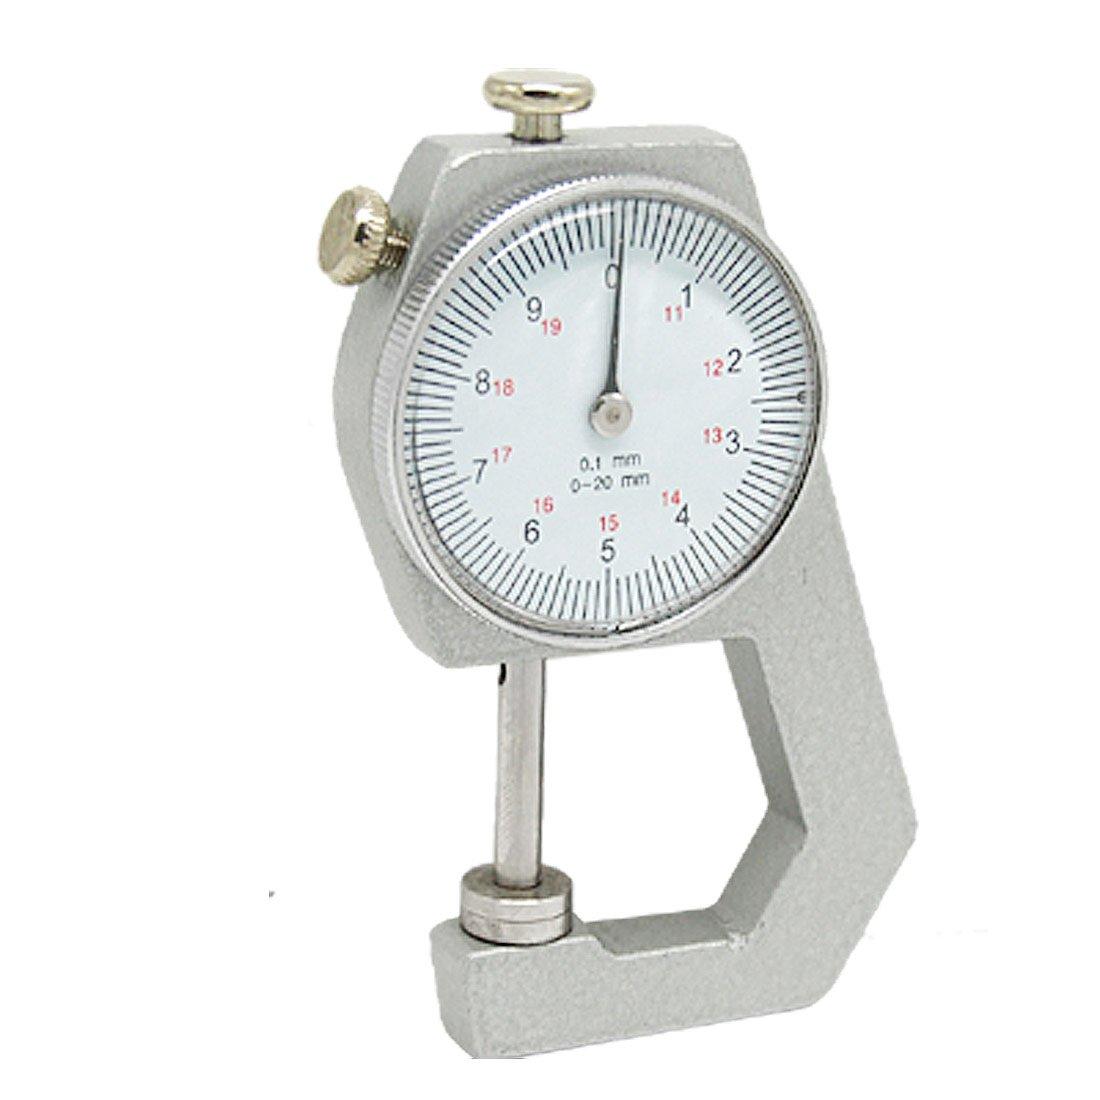 SODIAL(R) Herramienta de calibracion Calibre de medicion de espesor de bolsillo 0 a 20mm